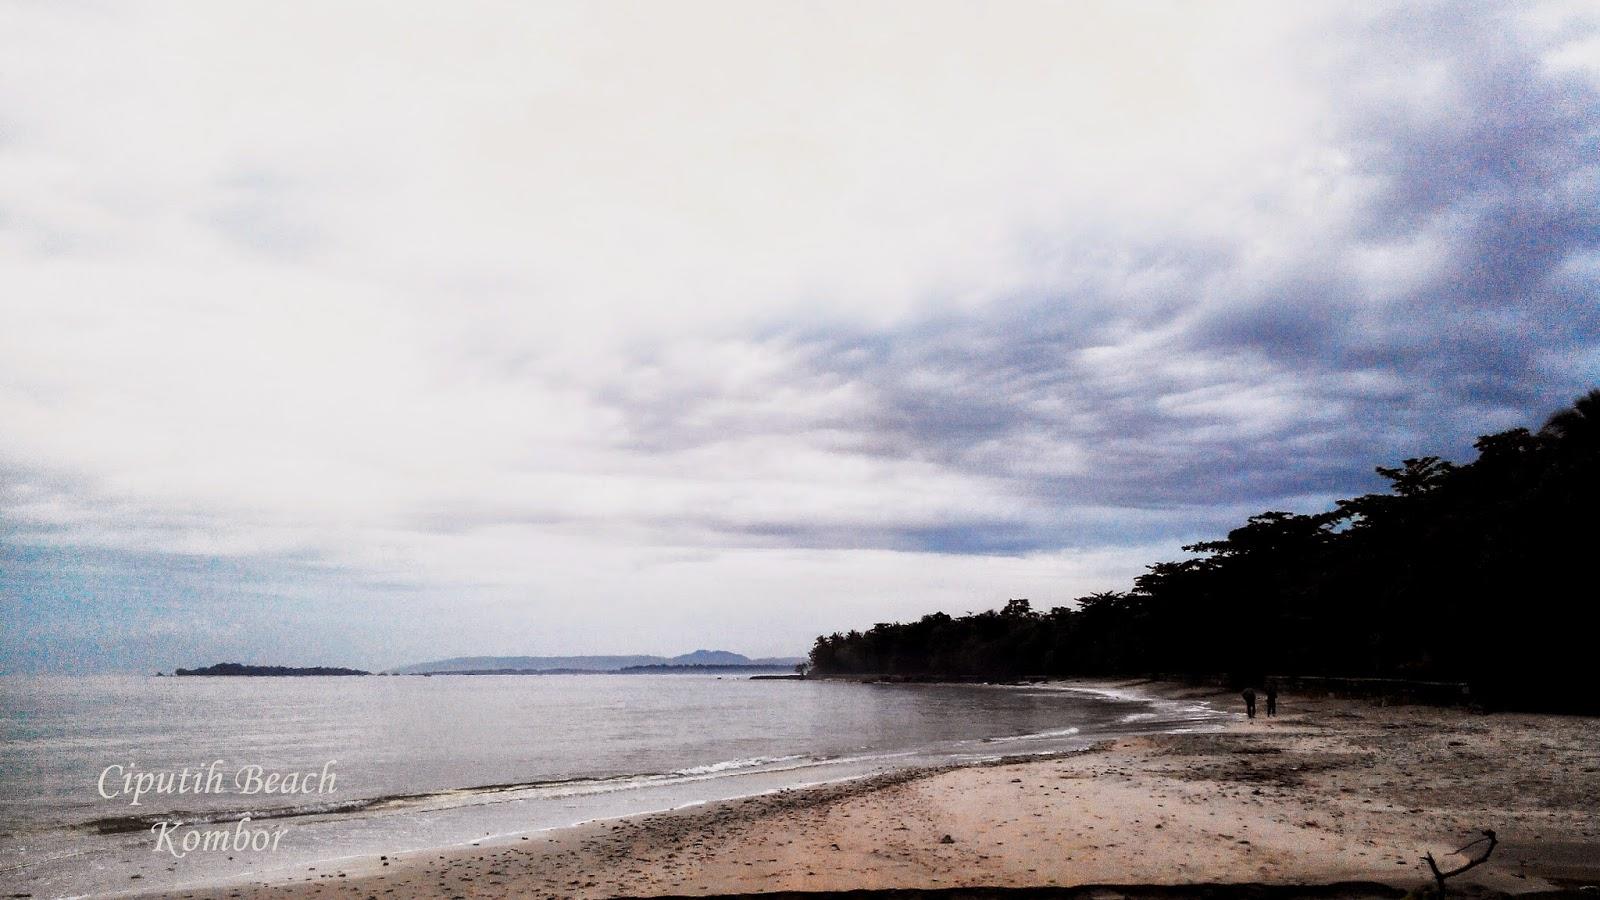 Pantai Ciputih, Ujung Kulon, Sumur, Pandeglang, Banten